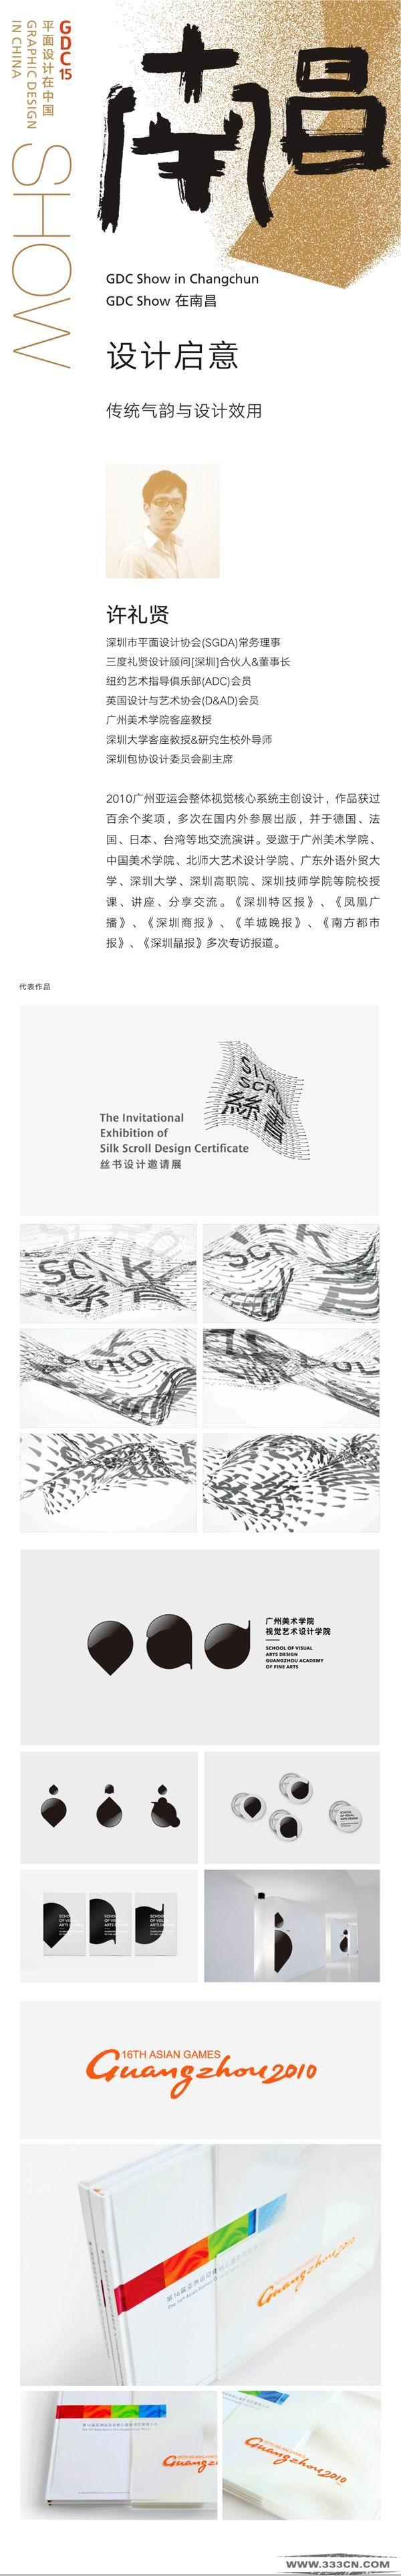 GDC Show 在南昌 设计启意 平面设计在中国